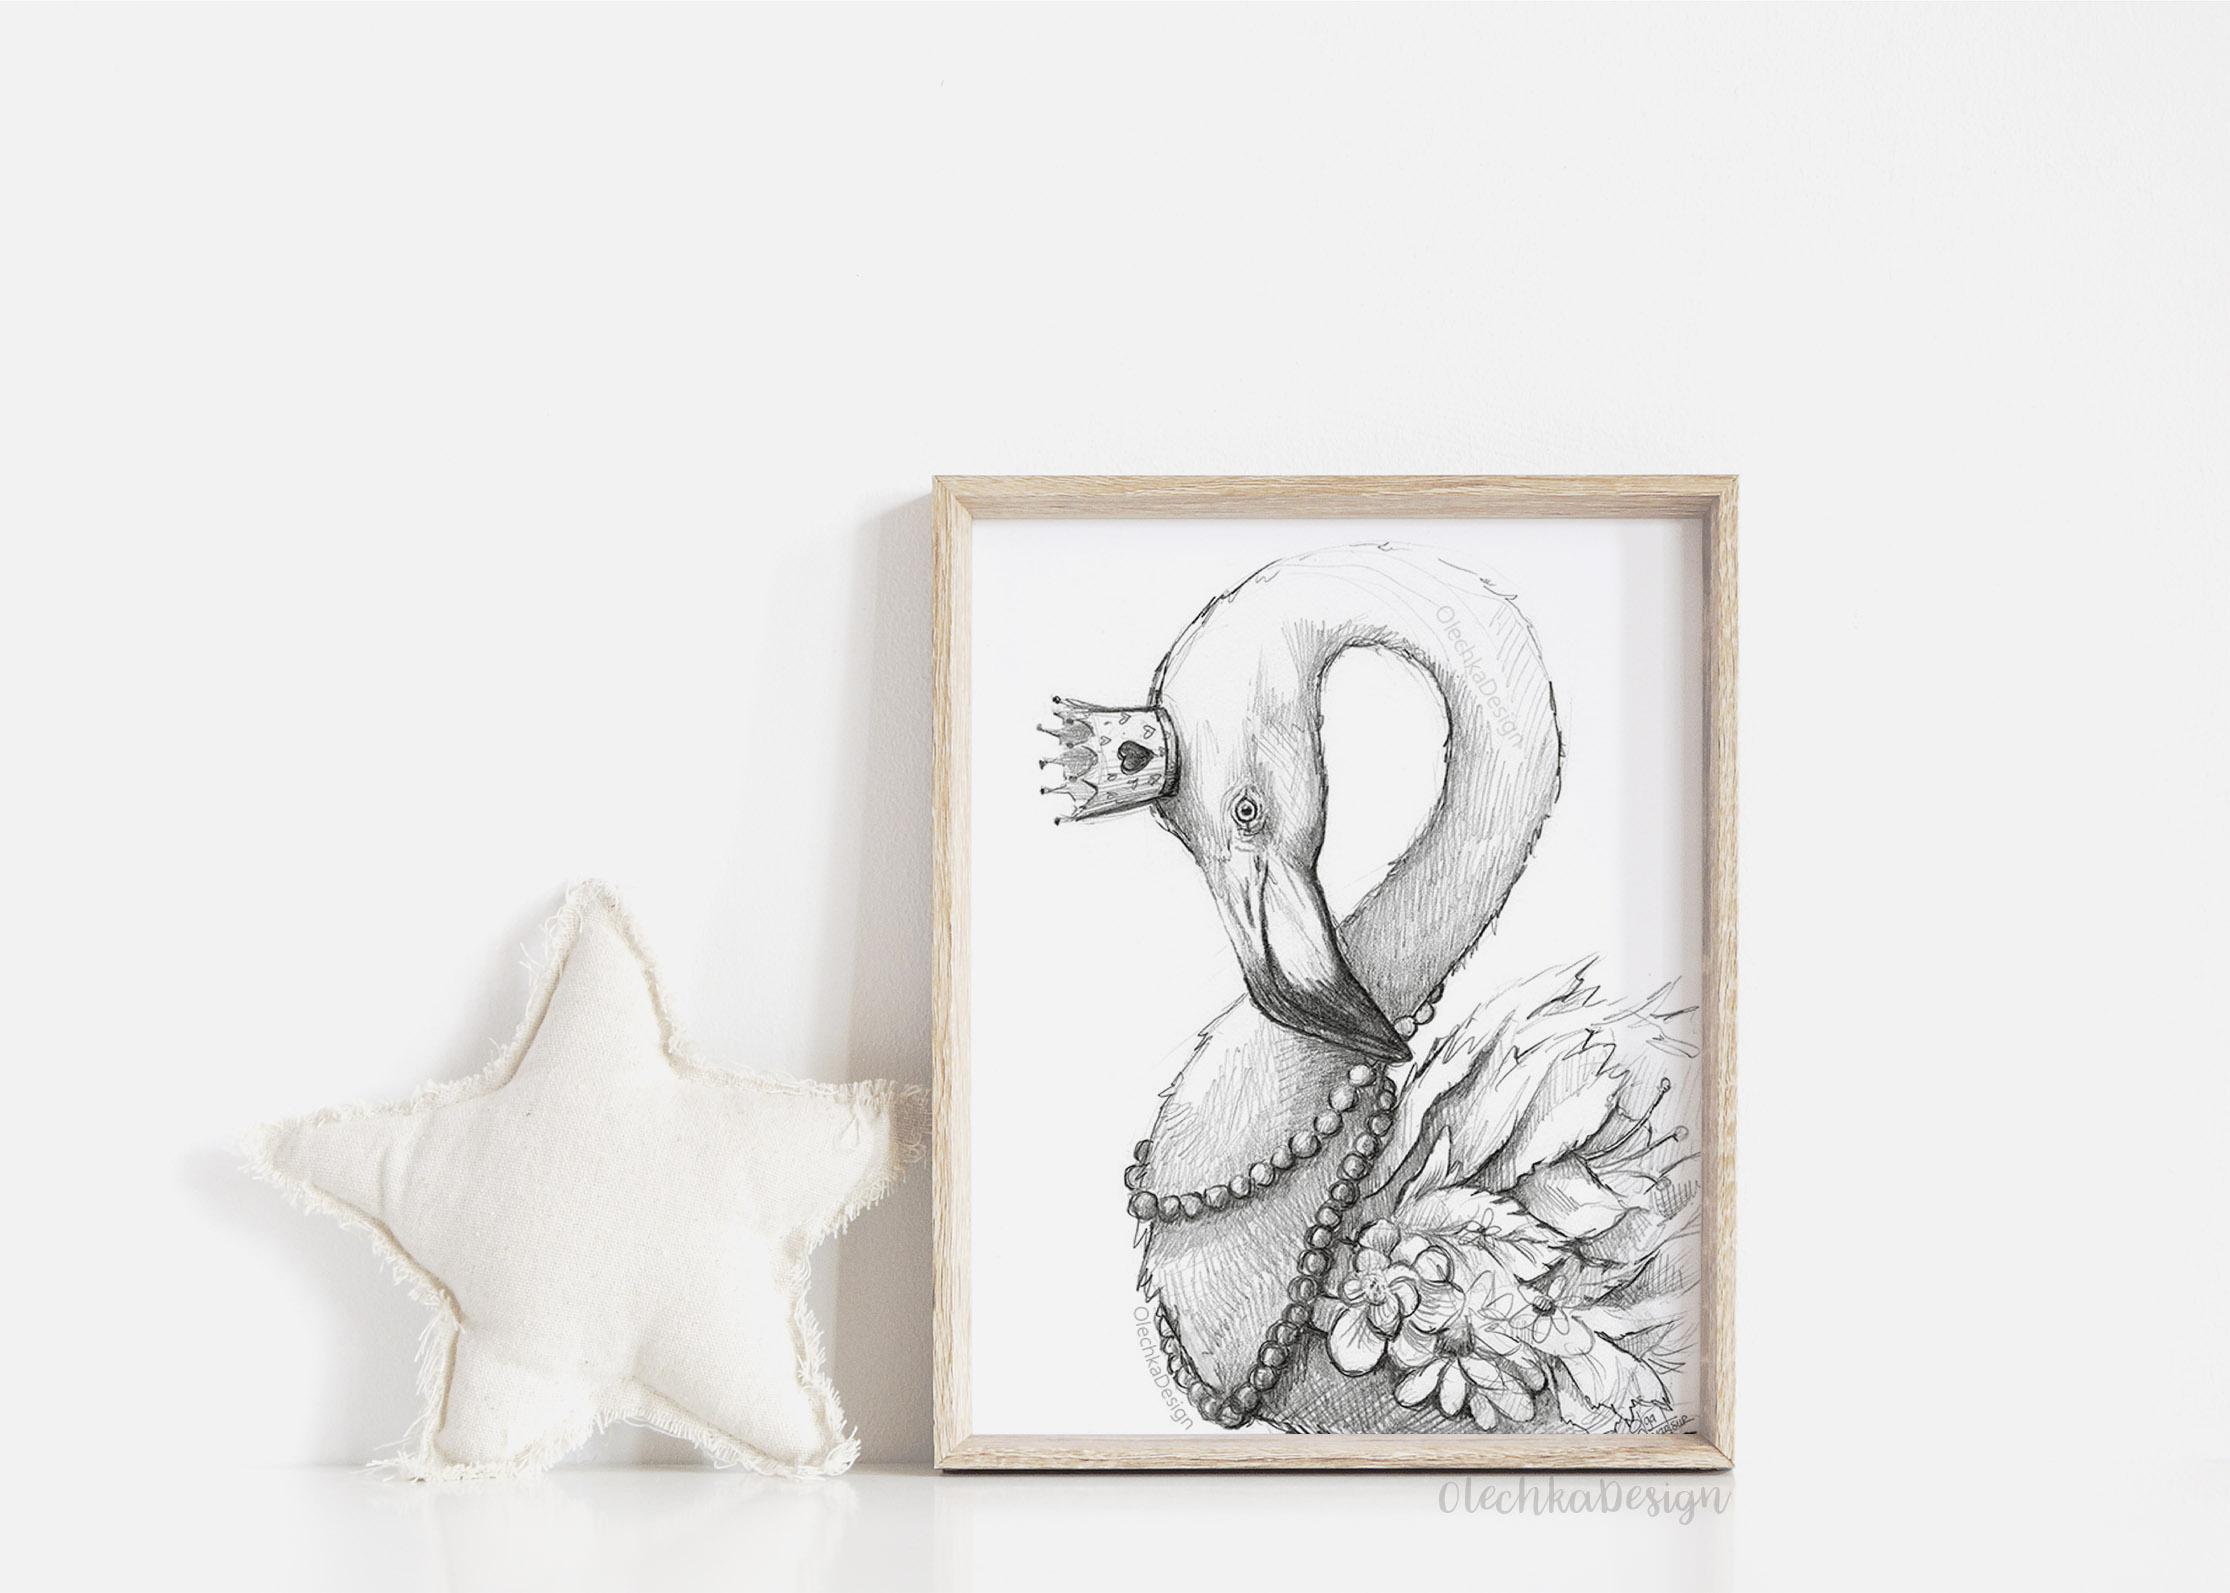 Flamingo-drawing-art.jpg